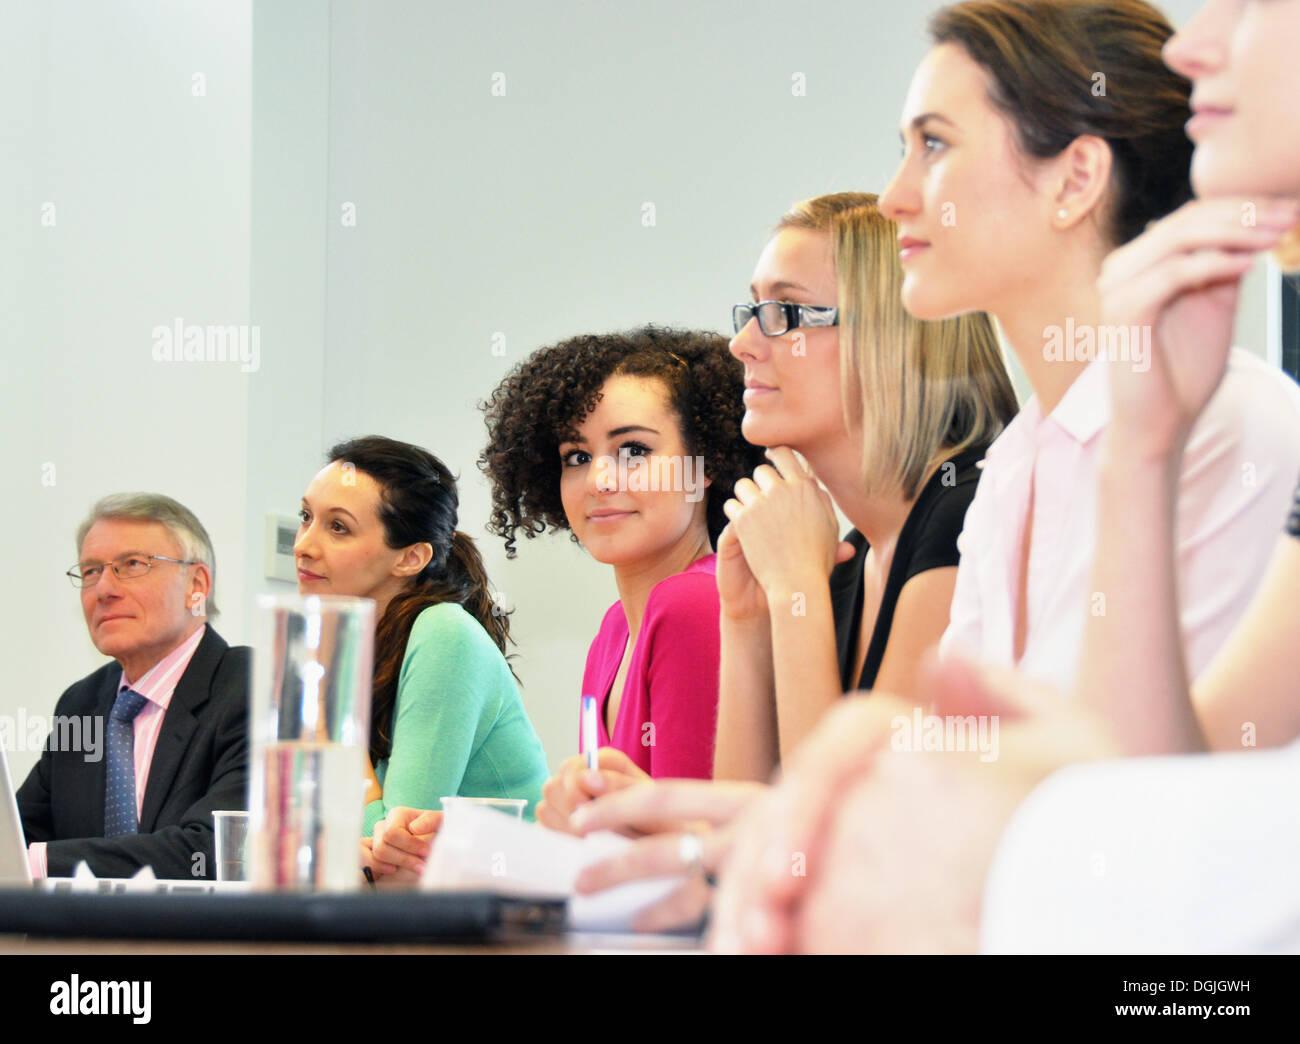 Compañeros de oficina en reunión Imagen De Stock